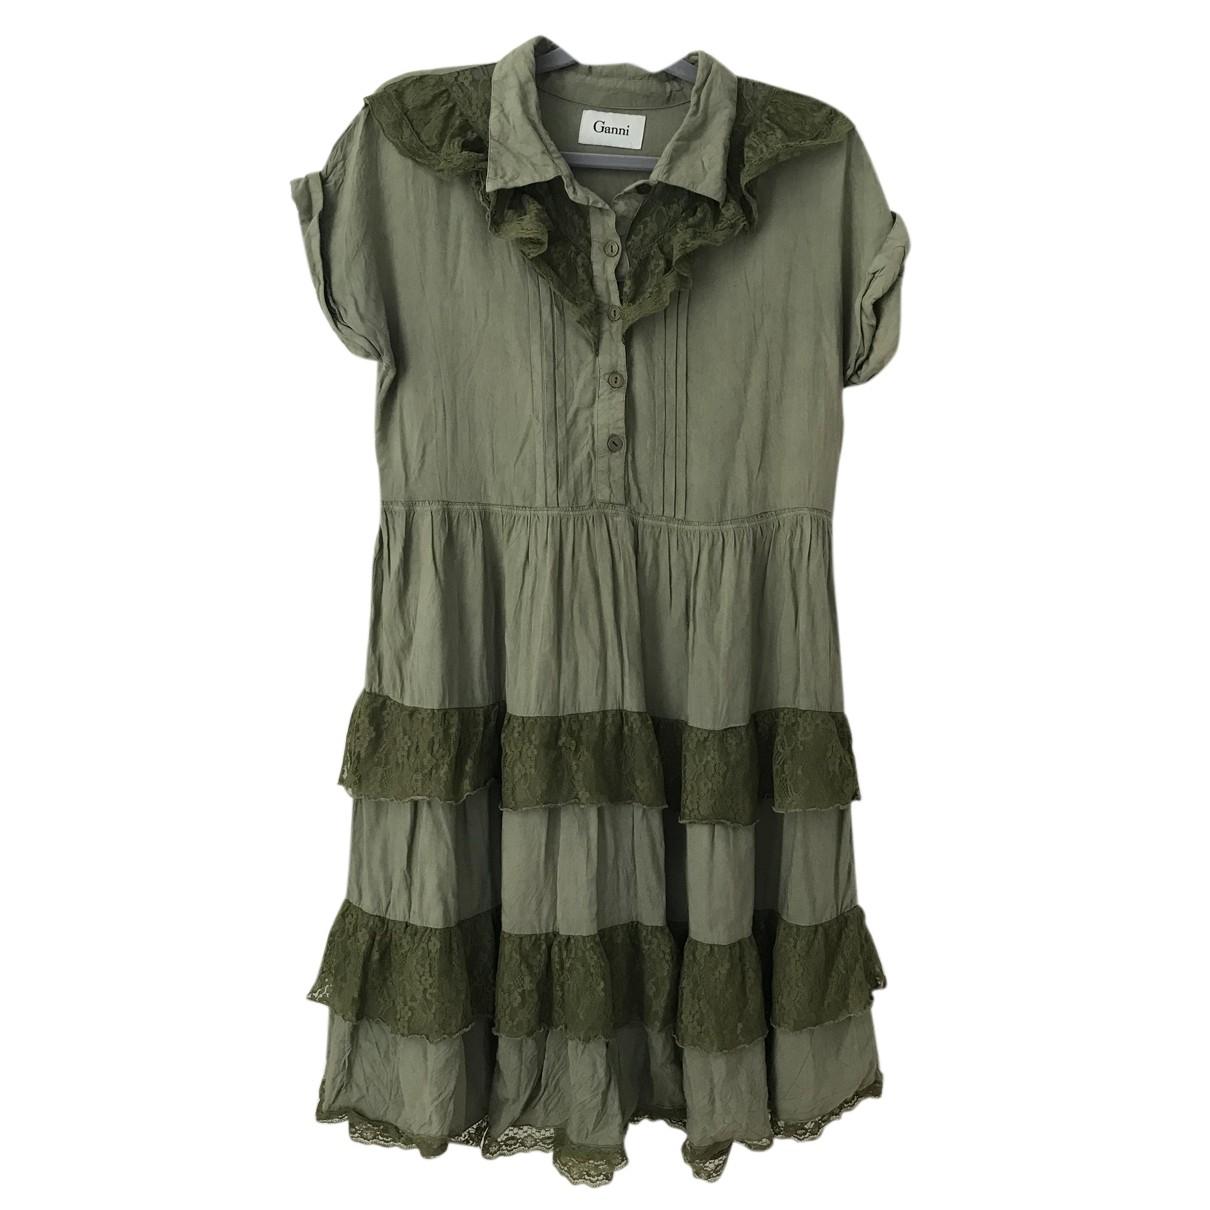 Ganni \N Kleid in  Khaki Baumwolle